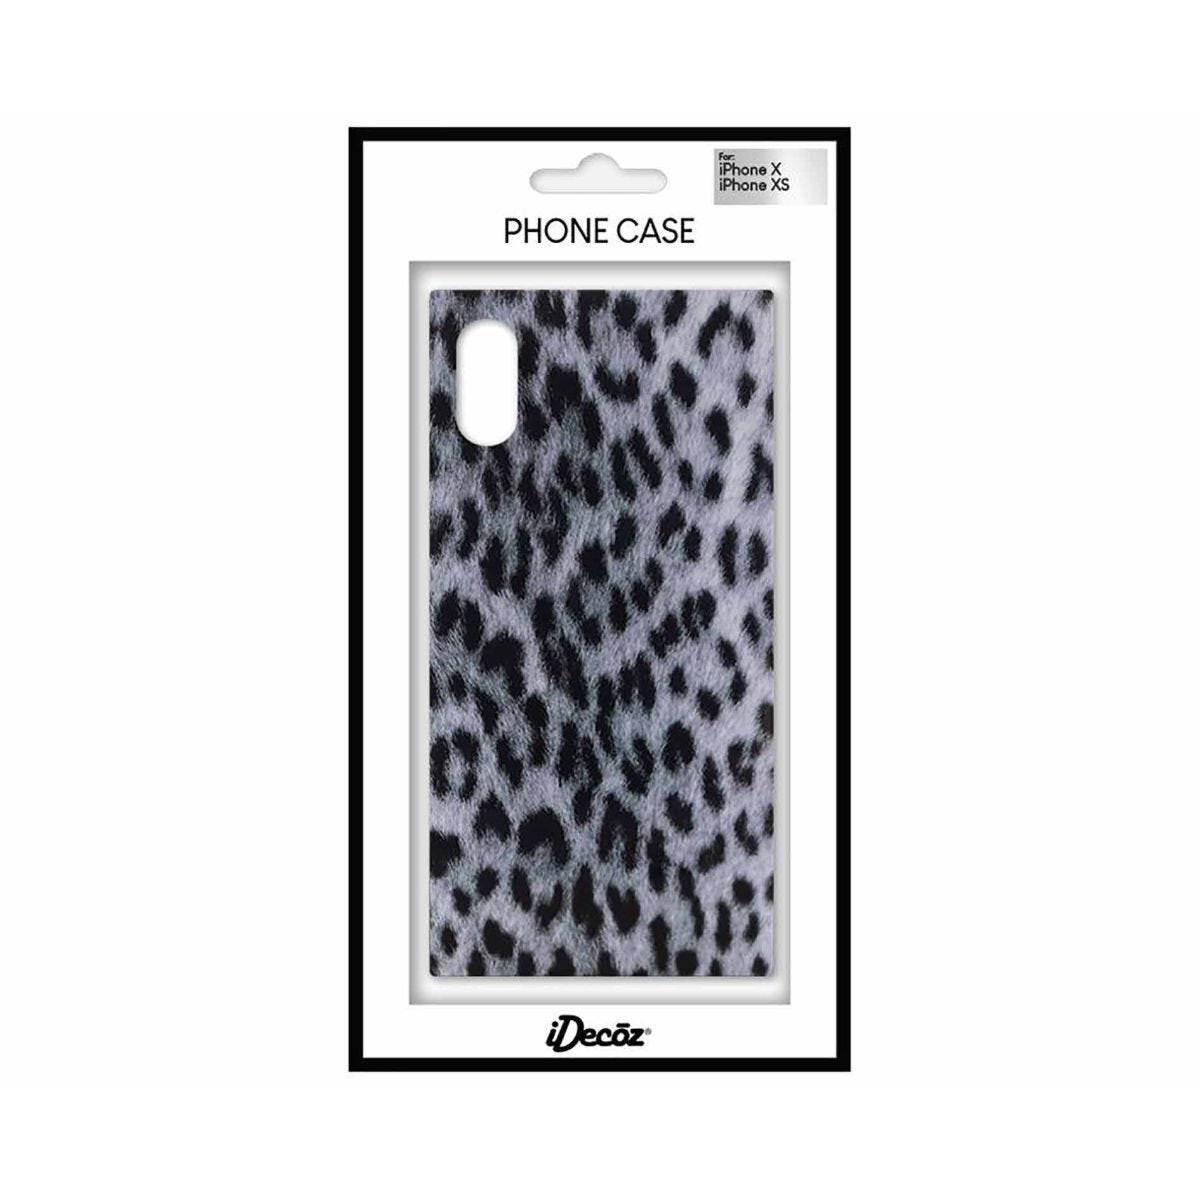 iDecoz iPhone X/XS Protective Case Leopard Print